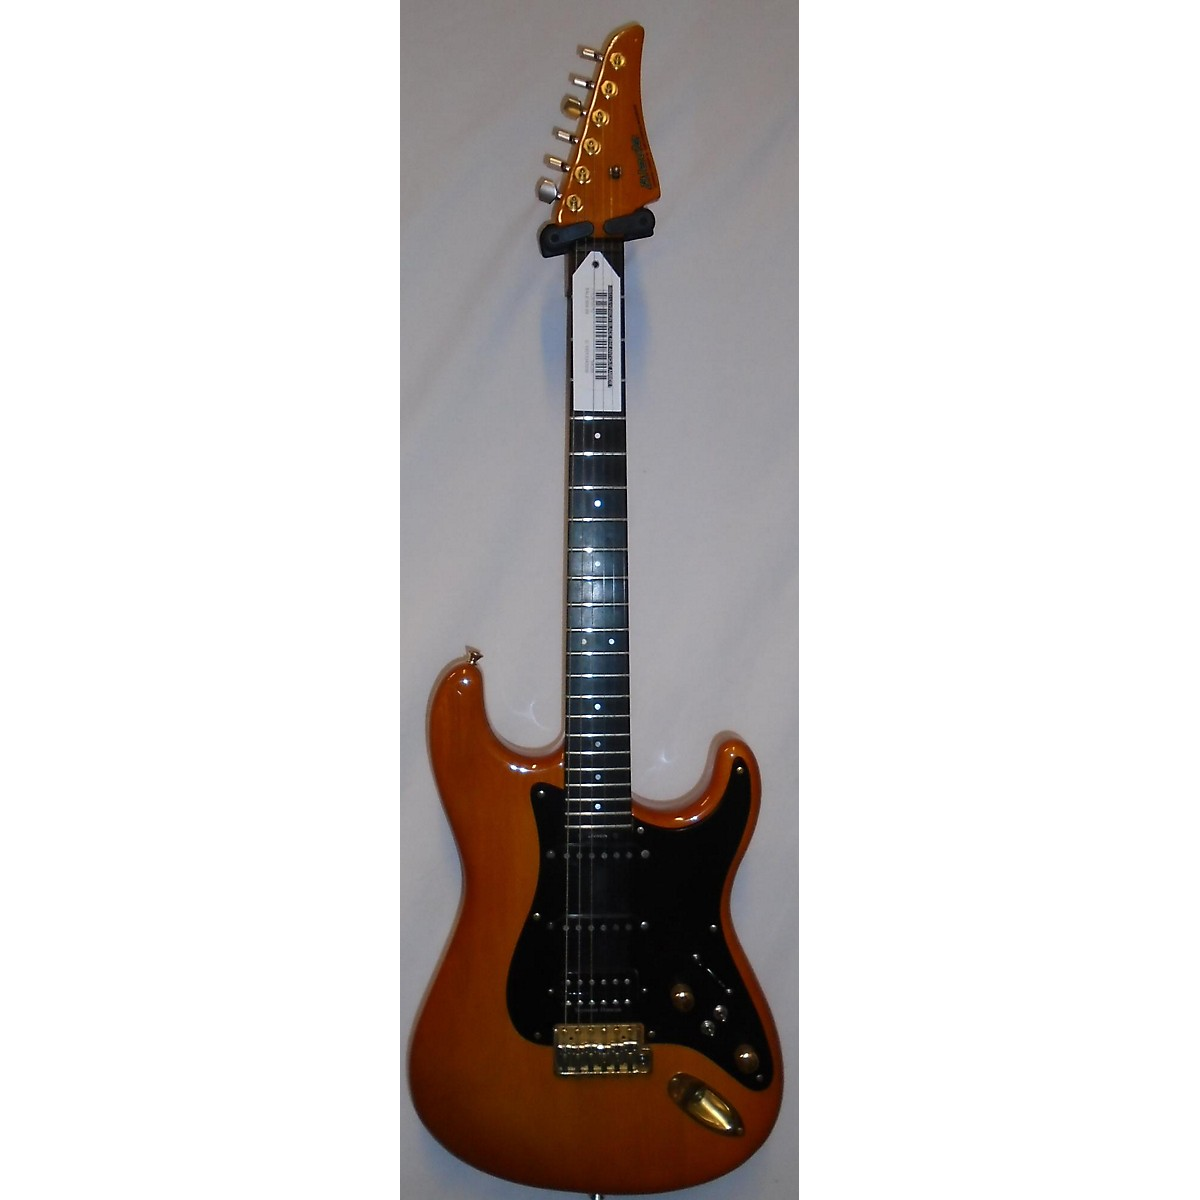 Levinson Blade Rh4 Solid Body Electric Guitar